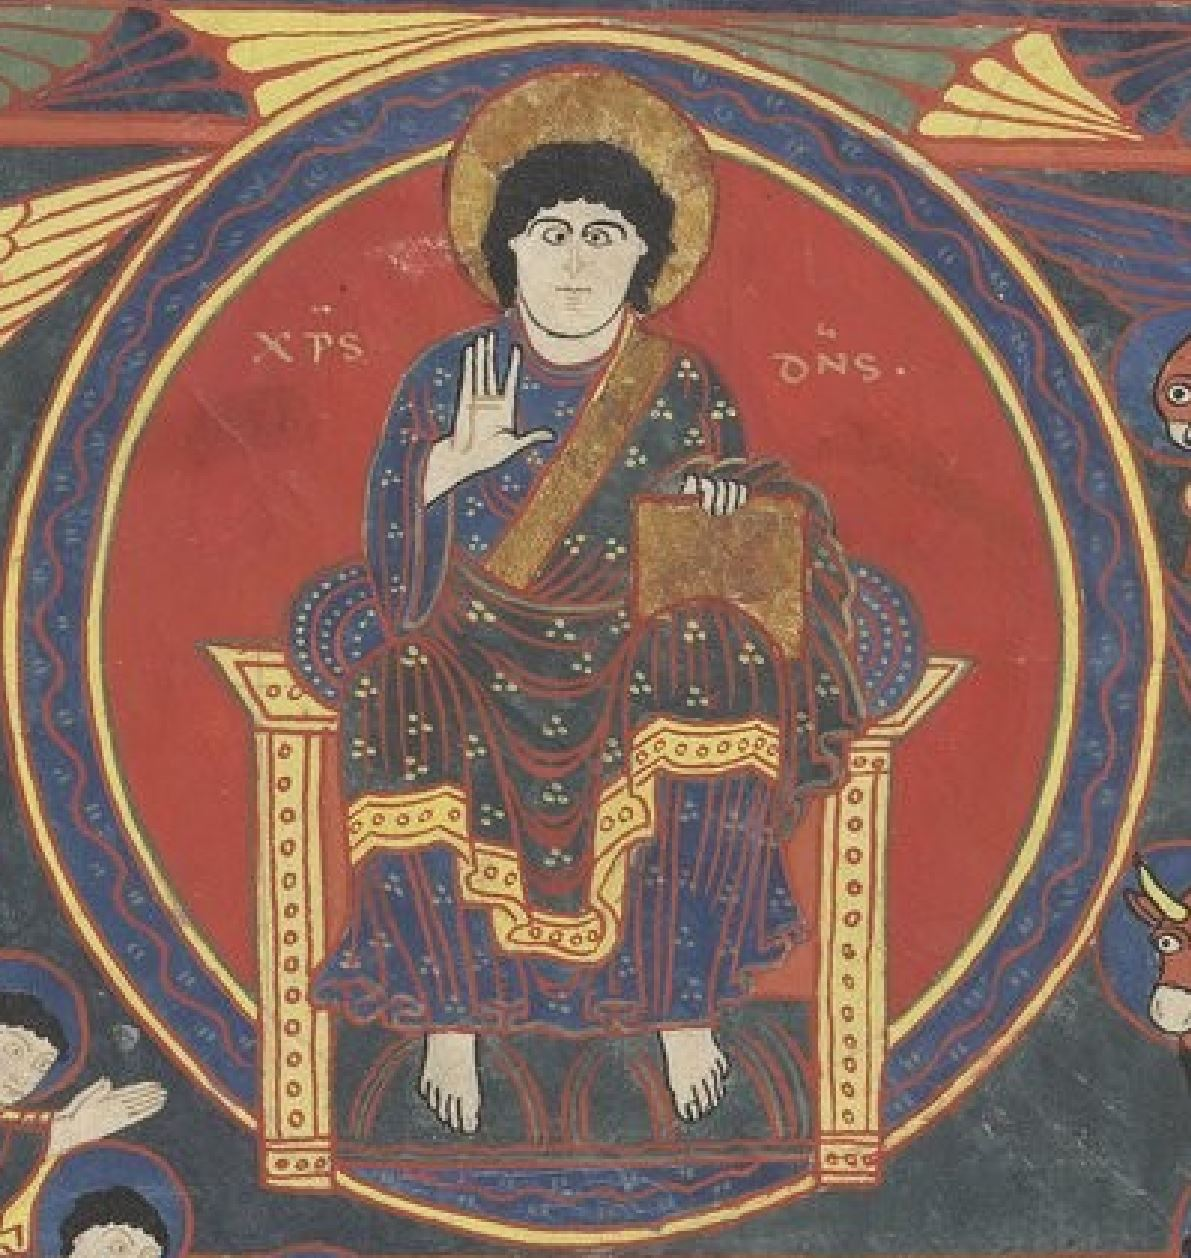 Beatus de saint Sever 1050 ca Apocalypse 19,1-9 fol 199r Artiste B MS Lat.8878 BNF gallica. detail